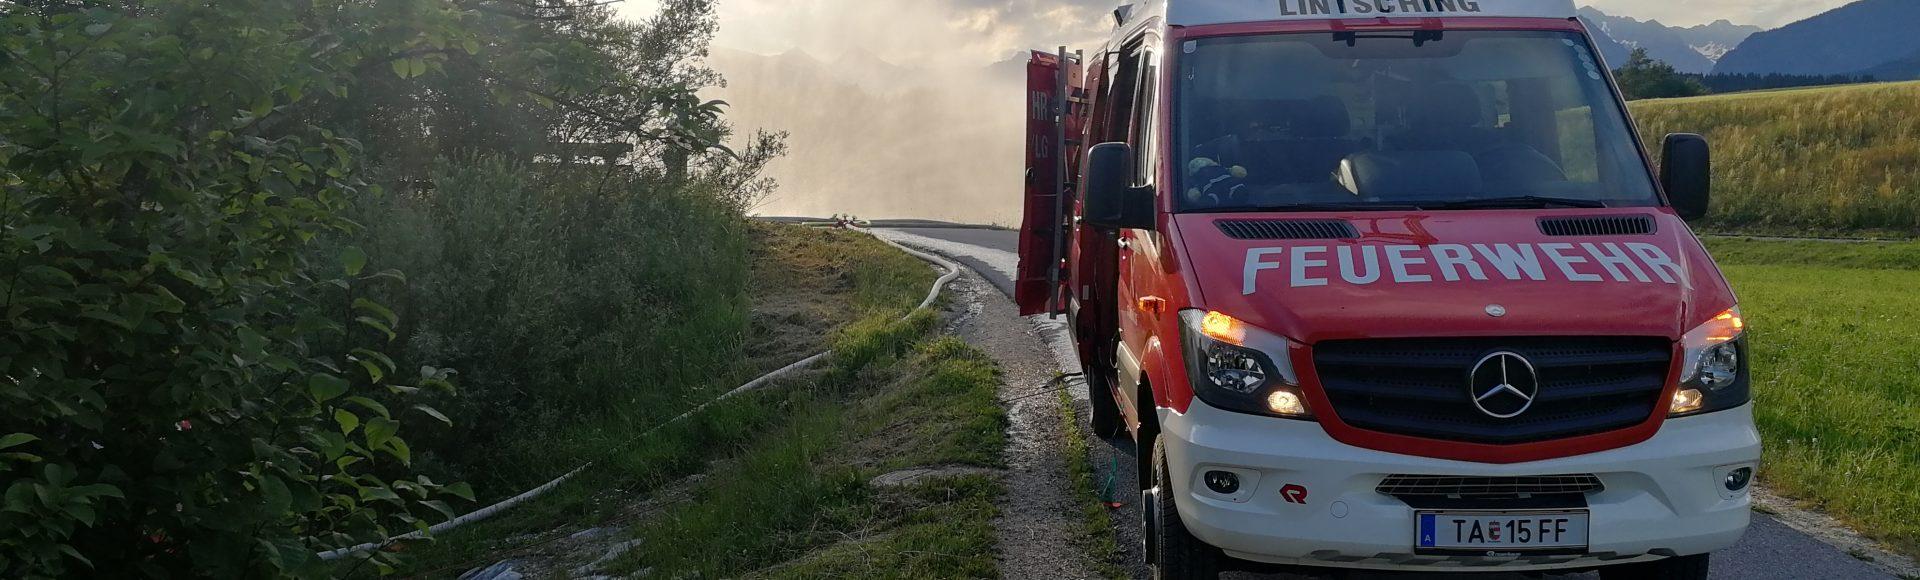 Feuerwehrübung Lintsching